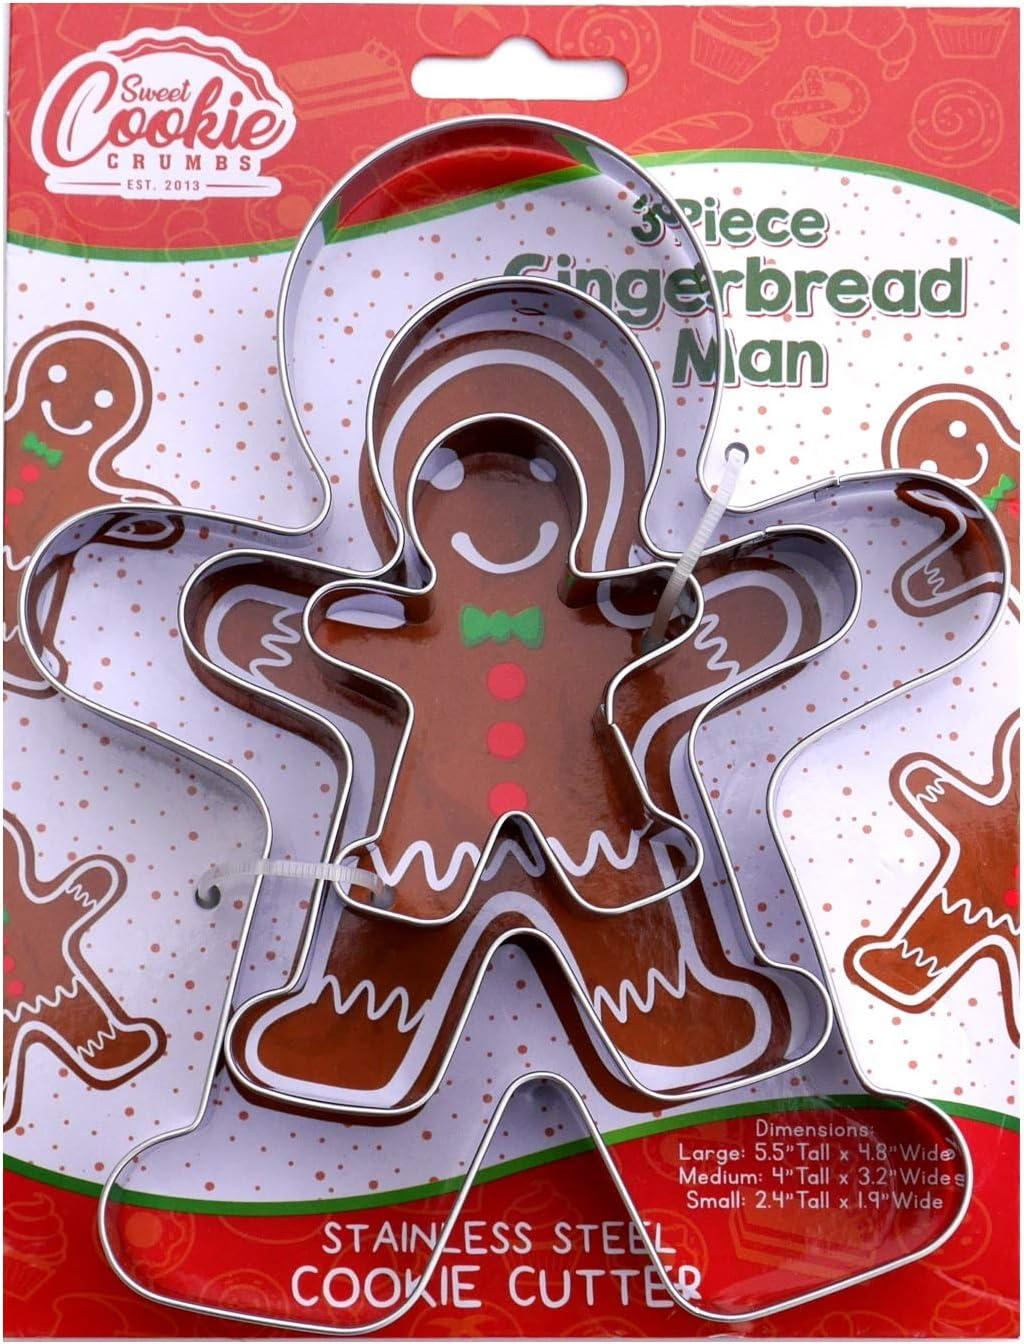 Gingerbread Man Cookie Cutter Set - 3 Piece - Large 5.8